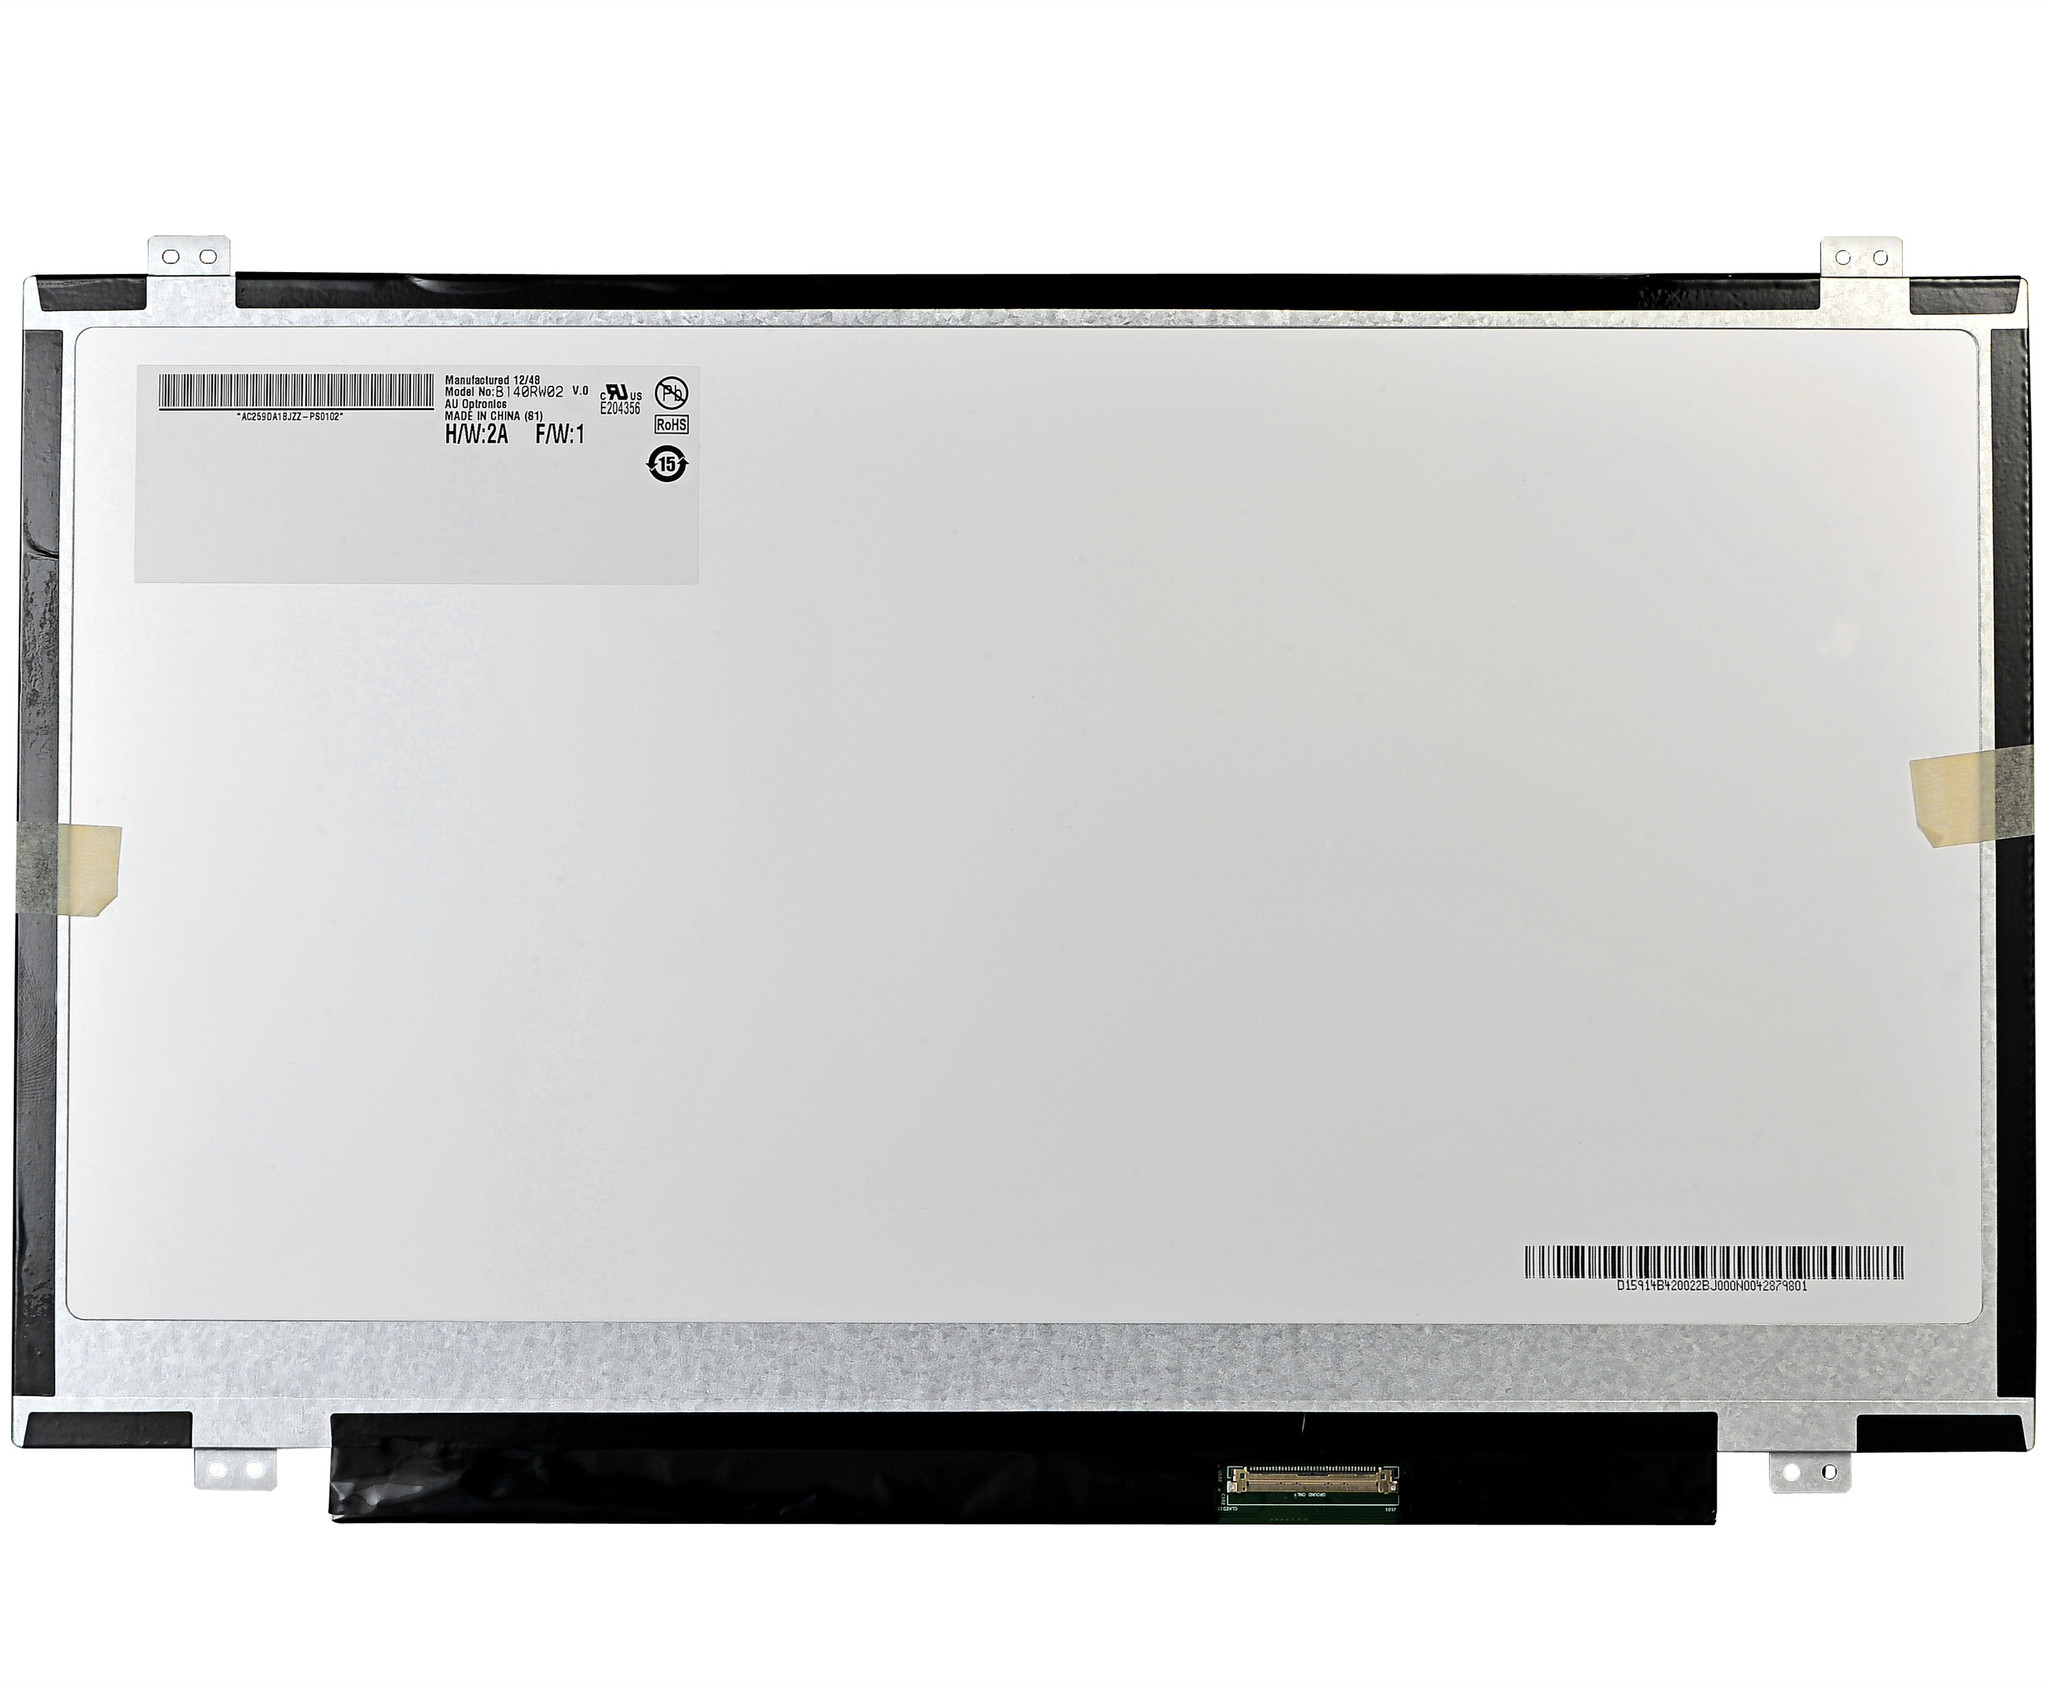 LCD Asus A450, A450c, A450ca, A450cc Series, Asus X450, X450c, X450ca, X450cc Series, Asus A450j, A450jb, A450jn, A450jf, Asus X450j, X450jb, X450jn, X450jf Series